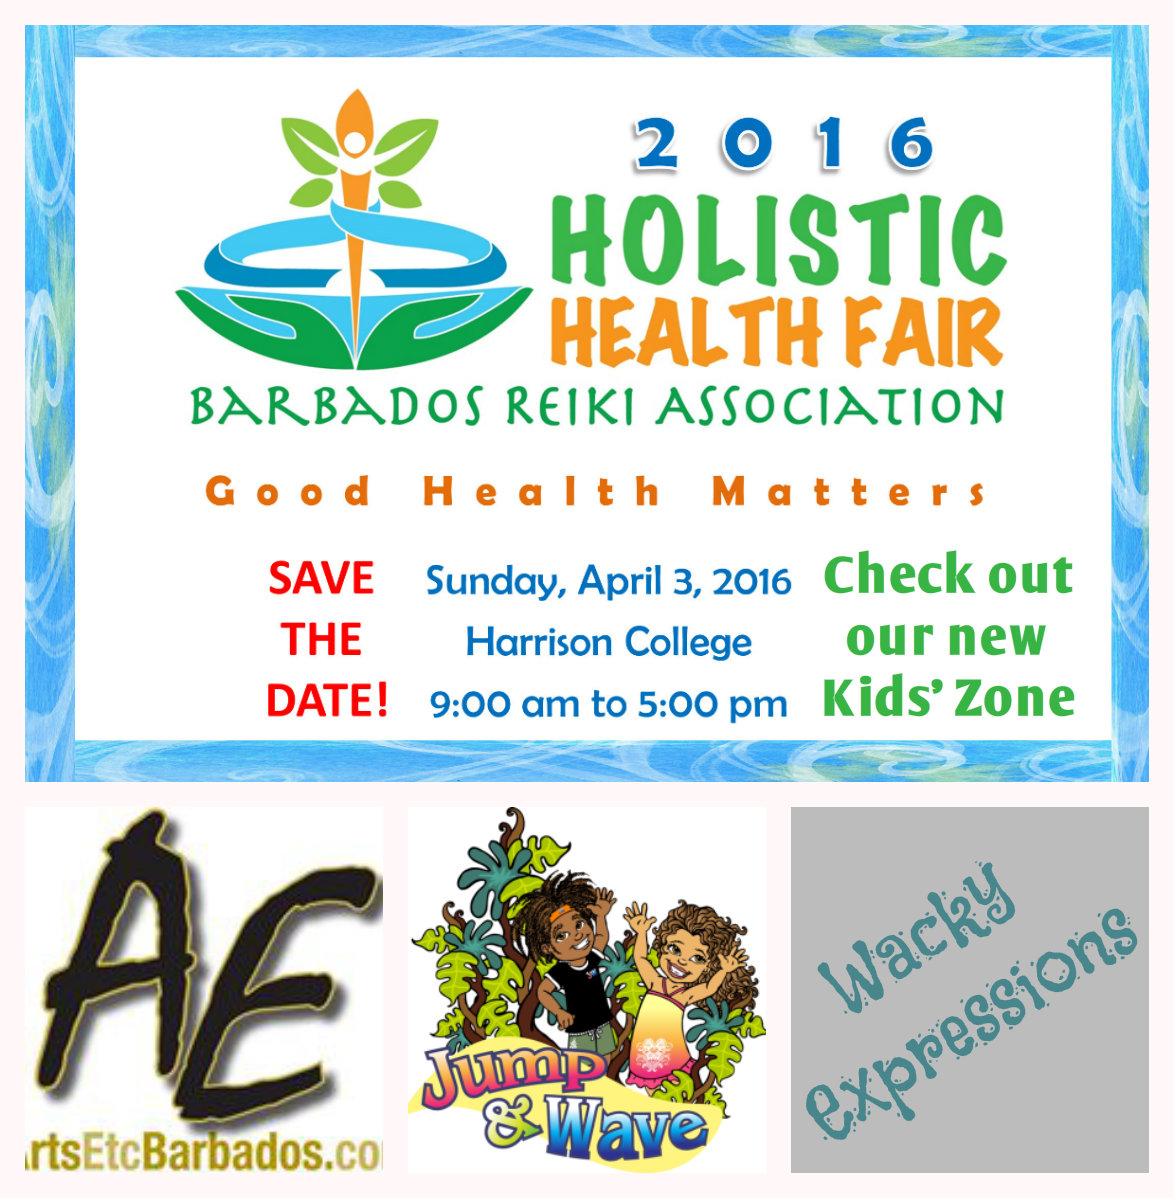 Reiki Association provides Kids' Zone at Holistic Health Fair